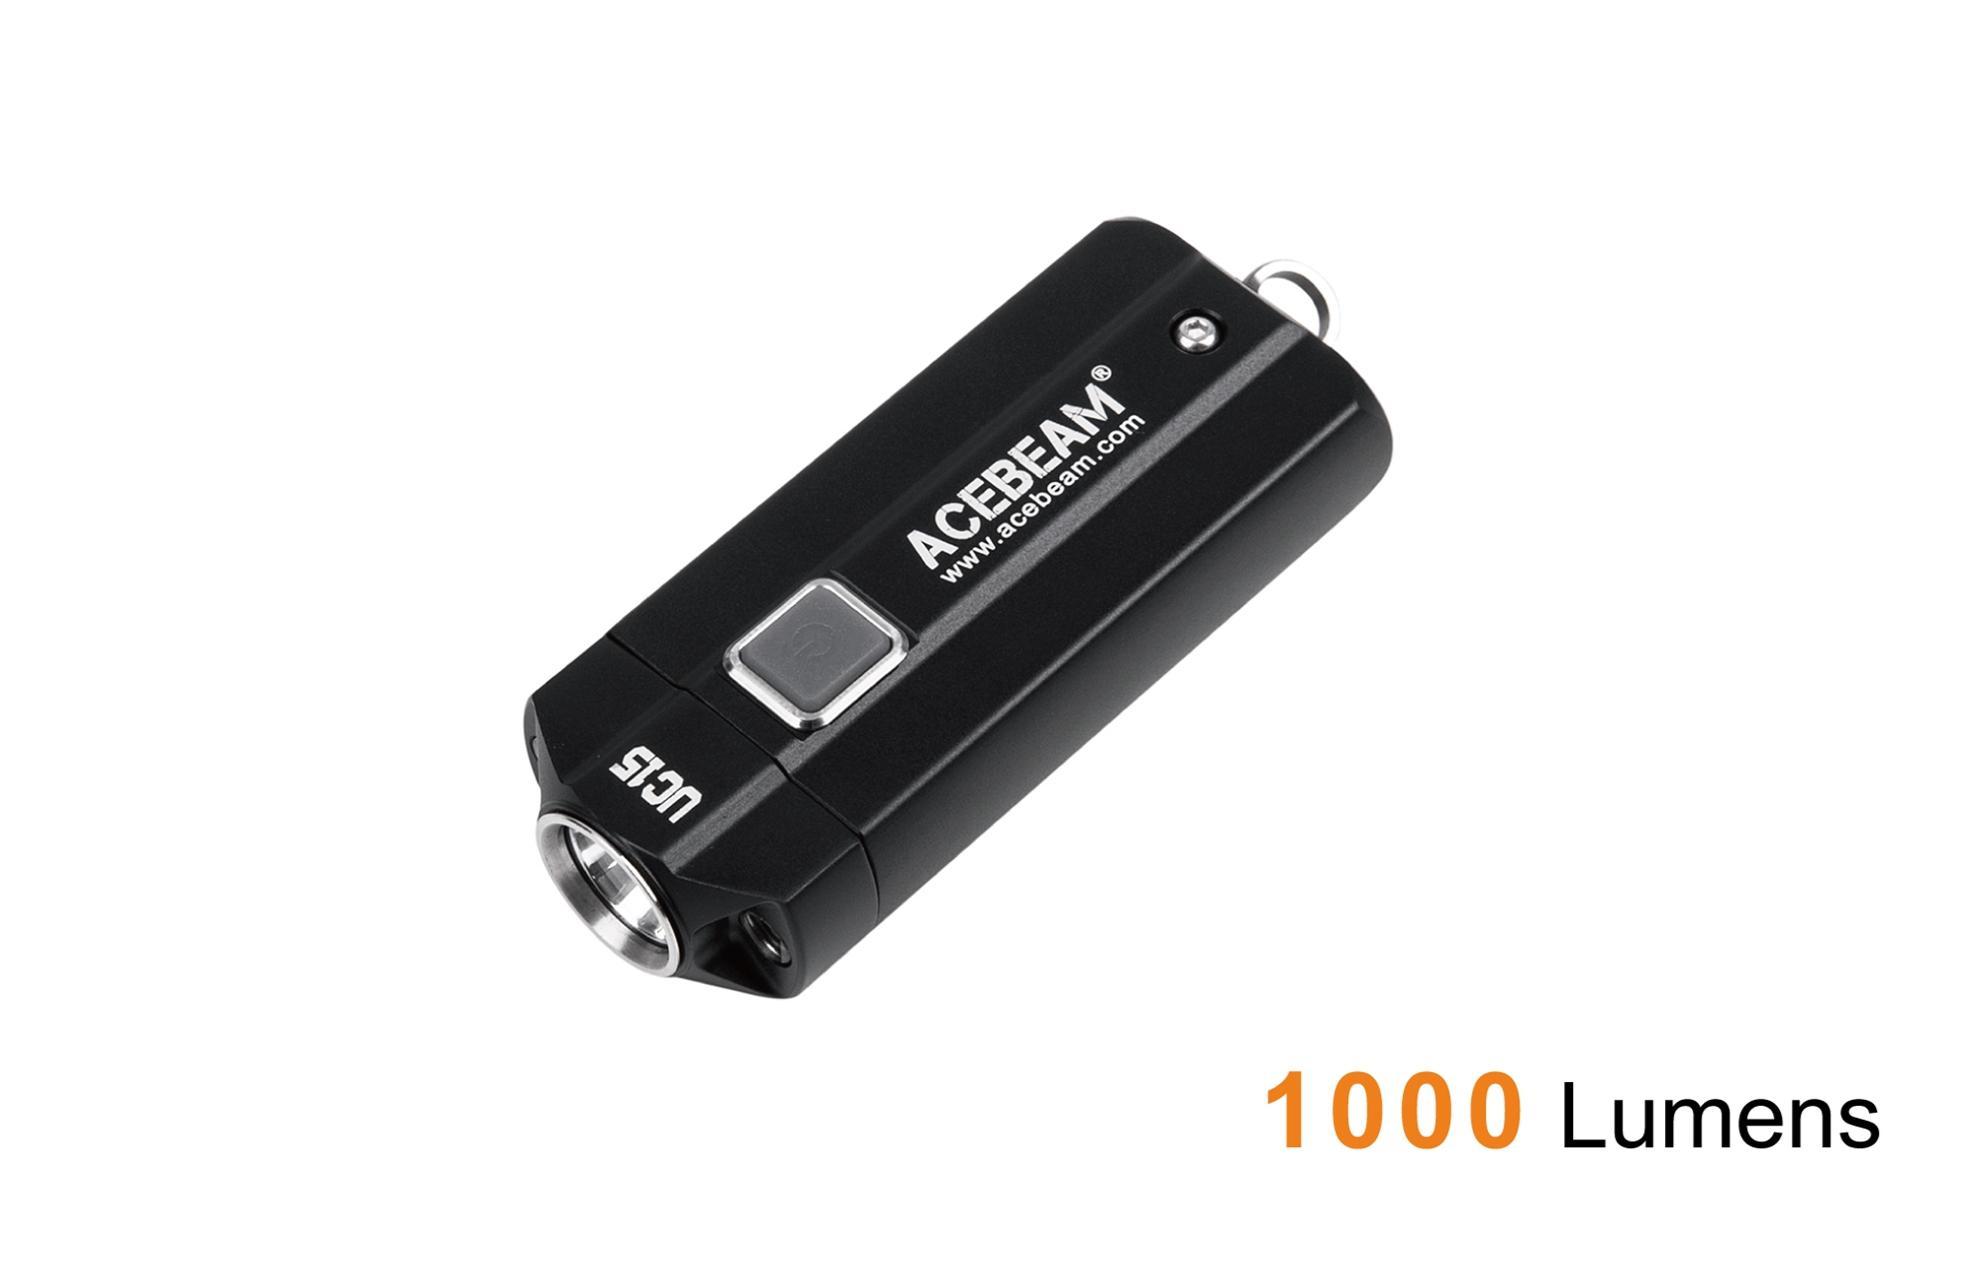 acebeam uc15 keychain light cree xpl hi led 1000 lumen rh andrew amanda com Automotive Wiring Harness Automotive Wiring Harness